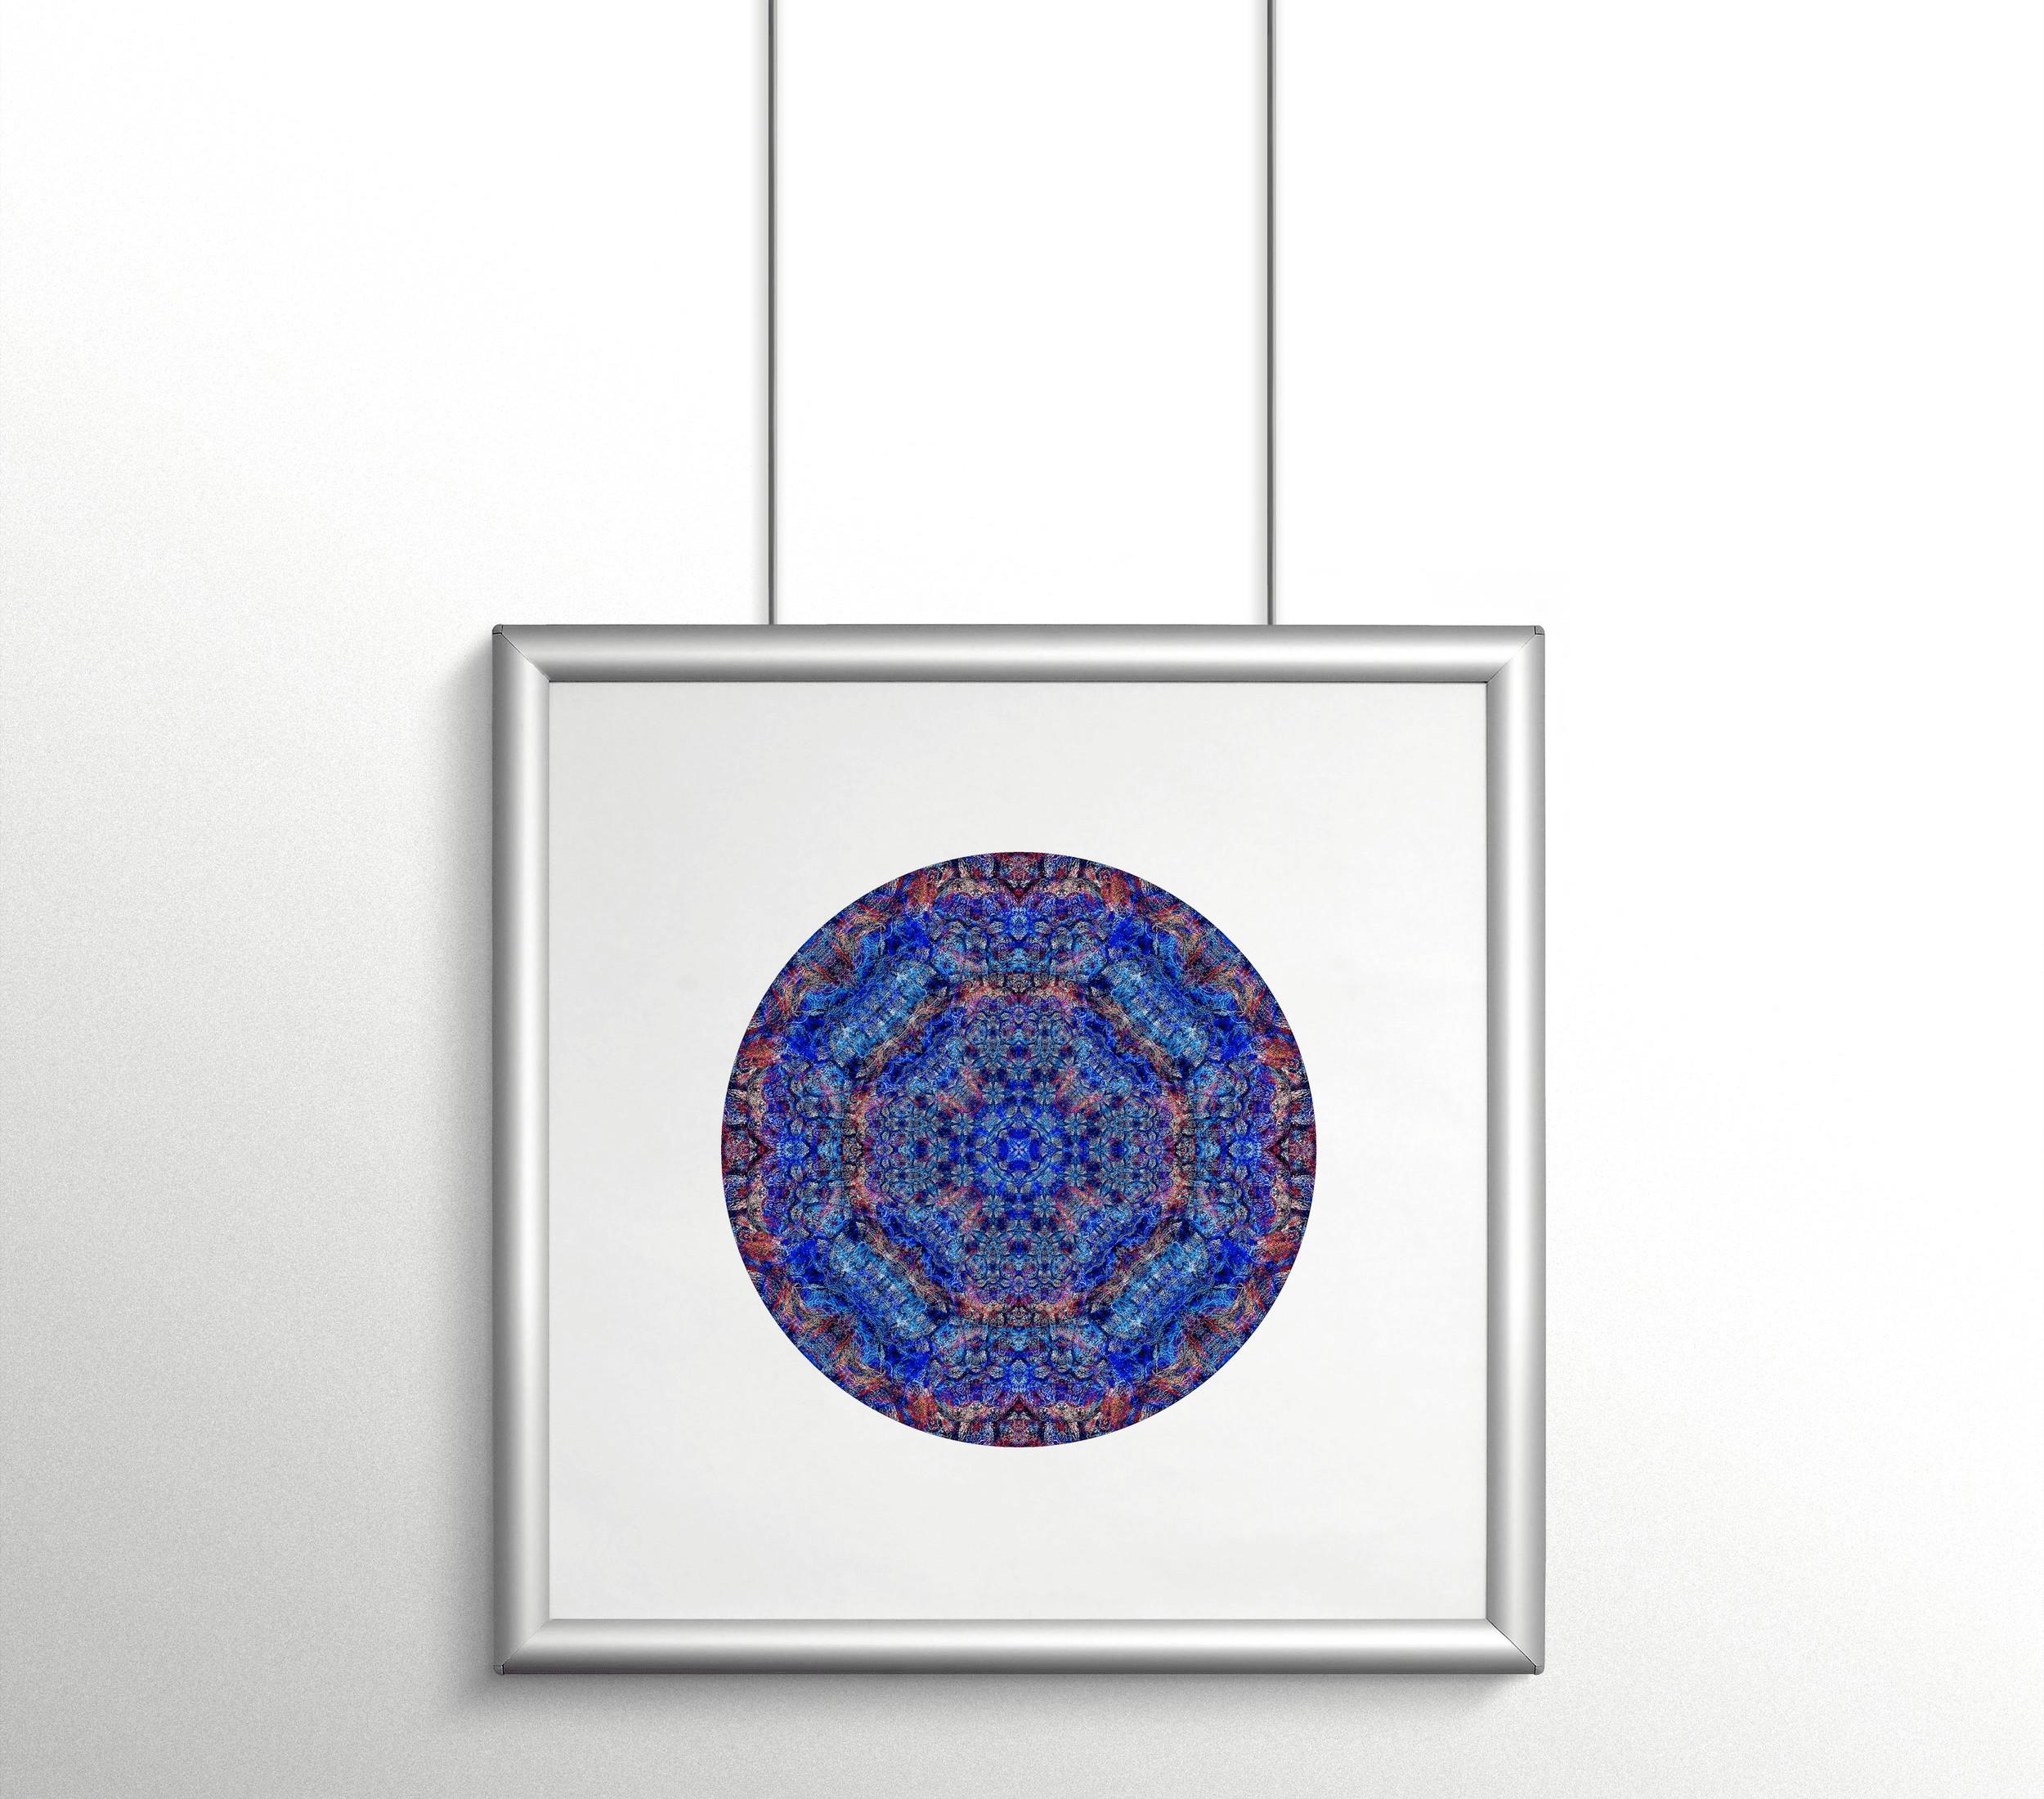 "<div class='title'>           Purple Geometry - 12""x12"" print on Kodak Endura metallic paper         </div>                 <div class='description'>           Modern mandala, titled ""Purple Geometry"" by Cameron Emmanuel         </div>"